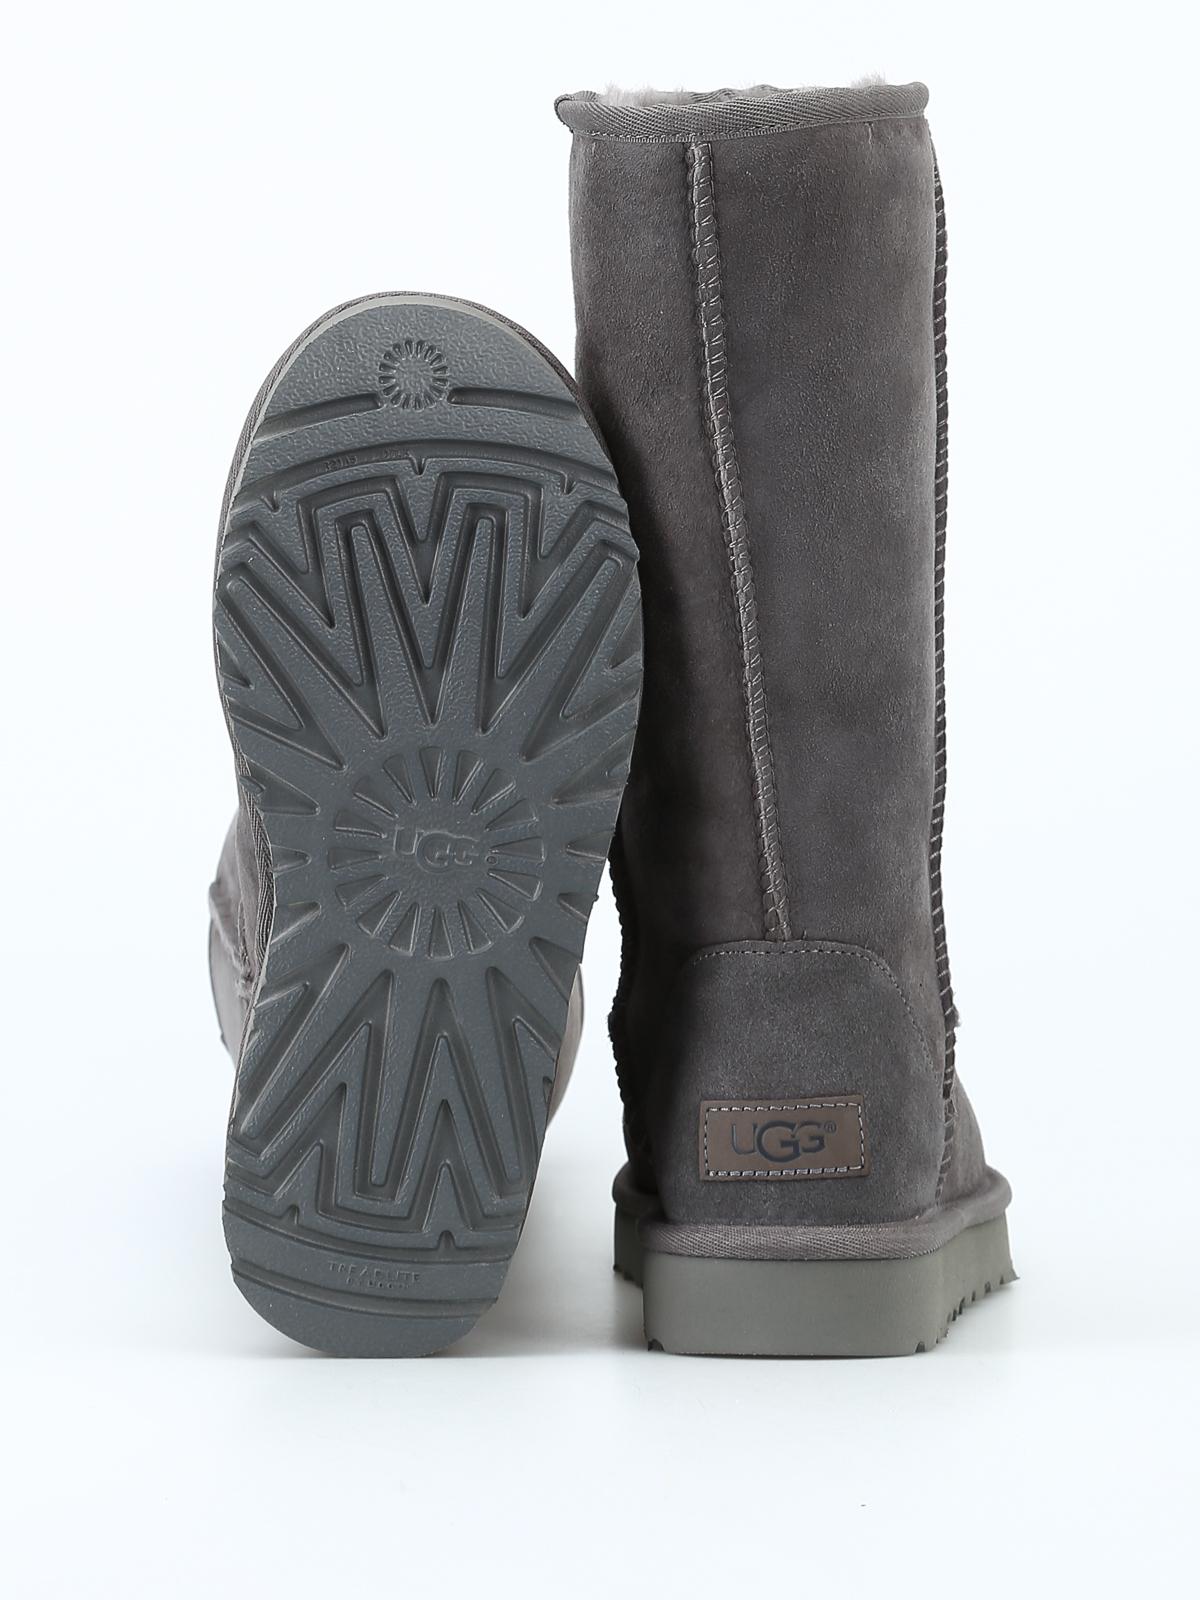 1344d50e435 Ugg - Classic Tall II grey boots - boots - 1016224 W Grey | iKRIX.com